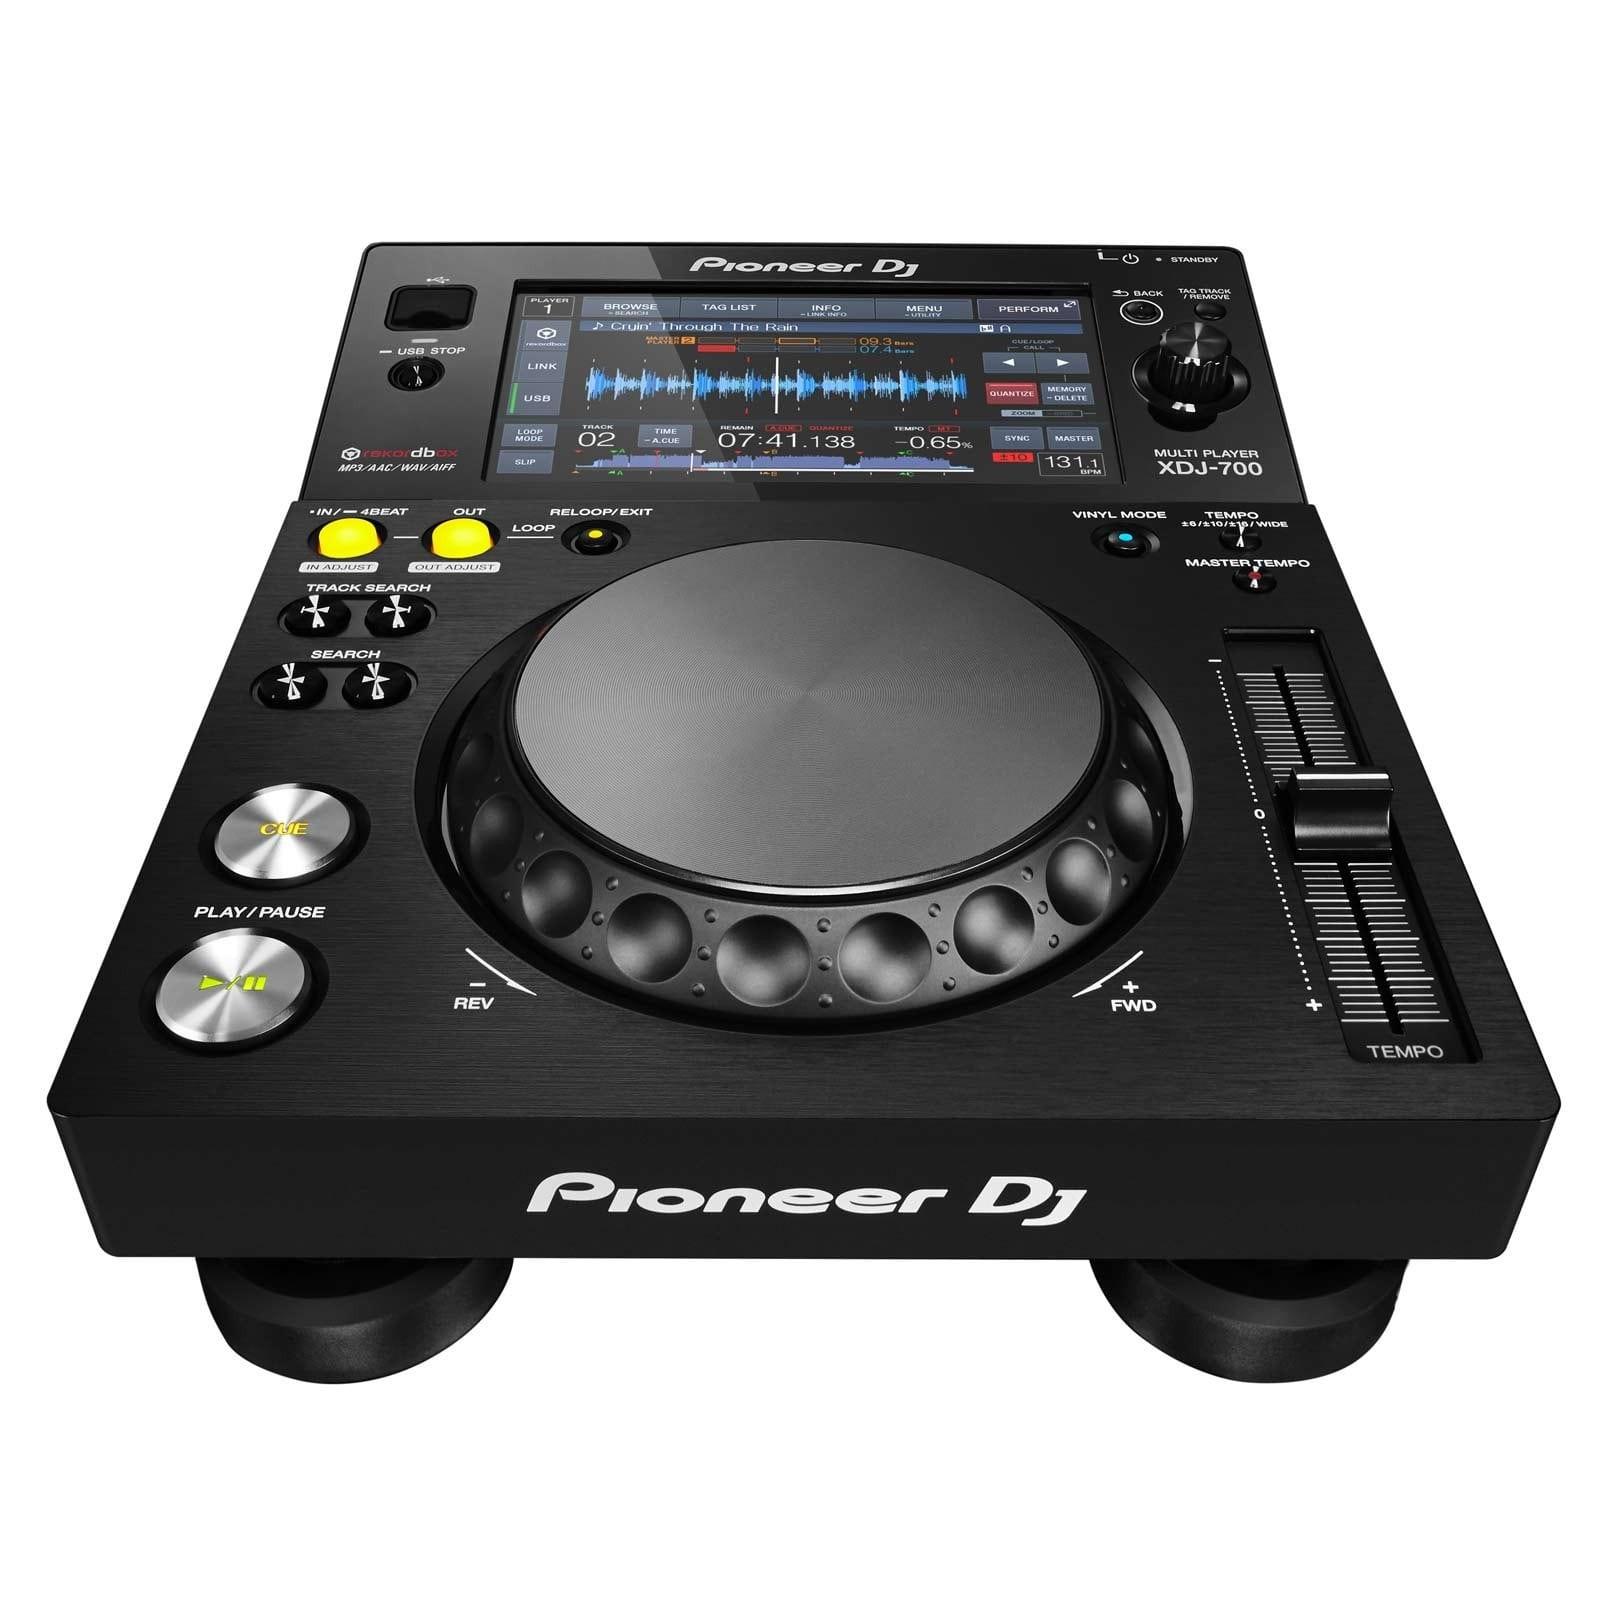 pioneer-xdj-700-rekordbox-compatible-compact-digital-deck-b97-2.jpg